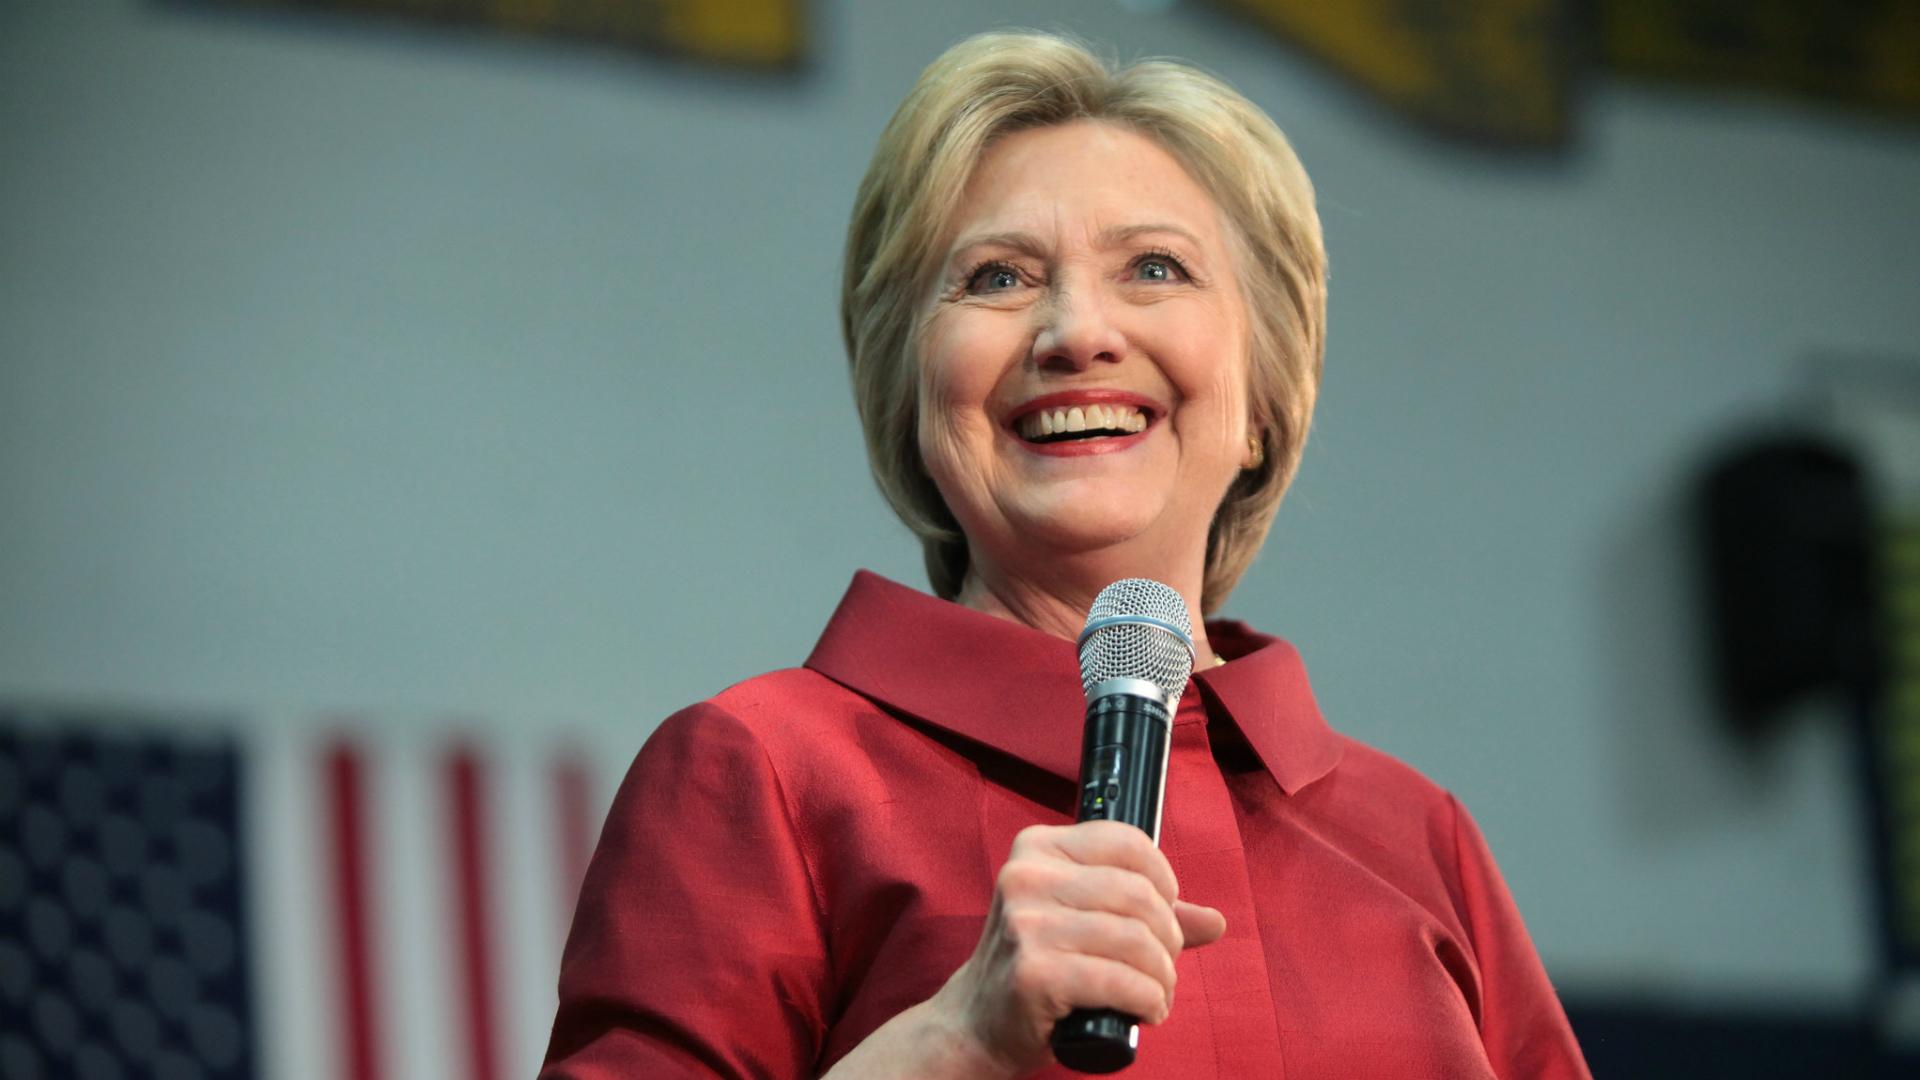 Hillary Clinton Hd